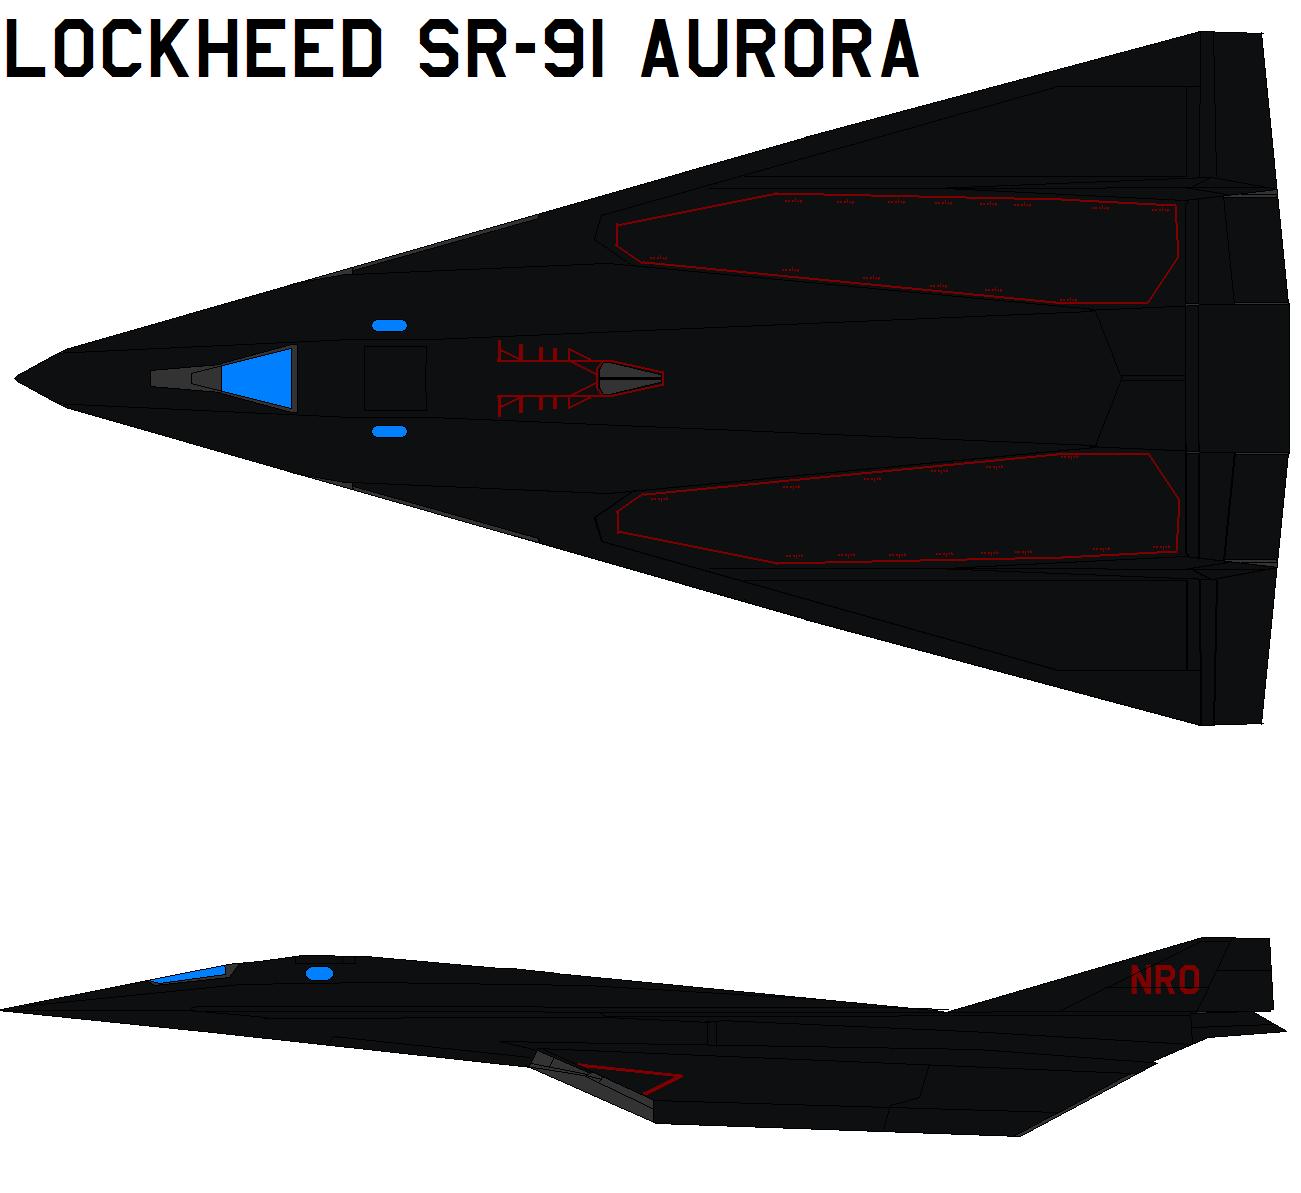 Lockheed SR-91 Aurora by bagera3005